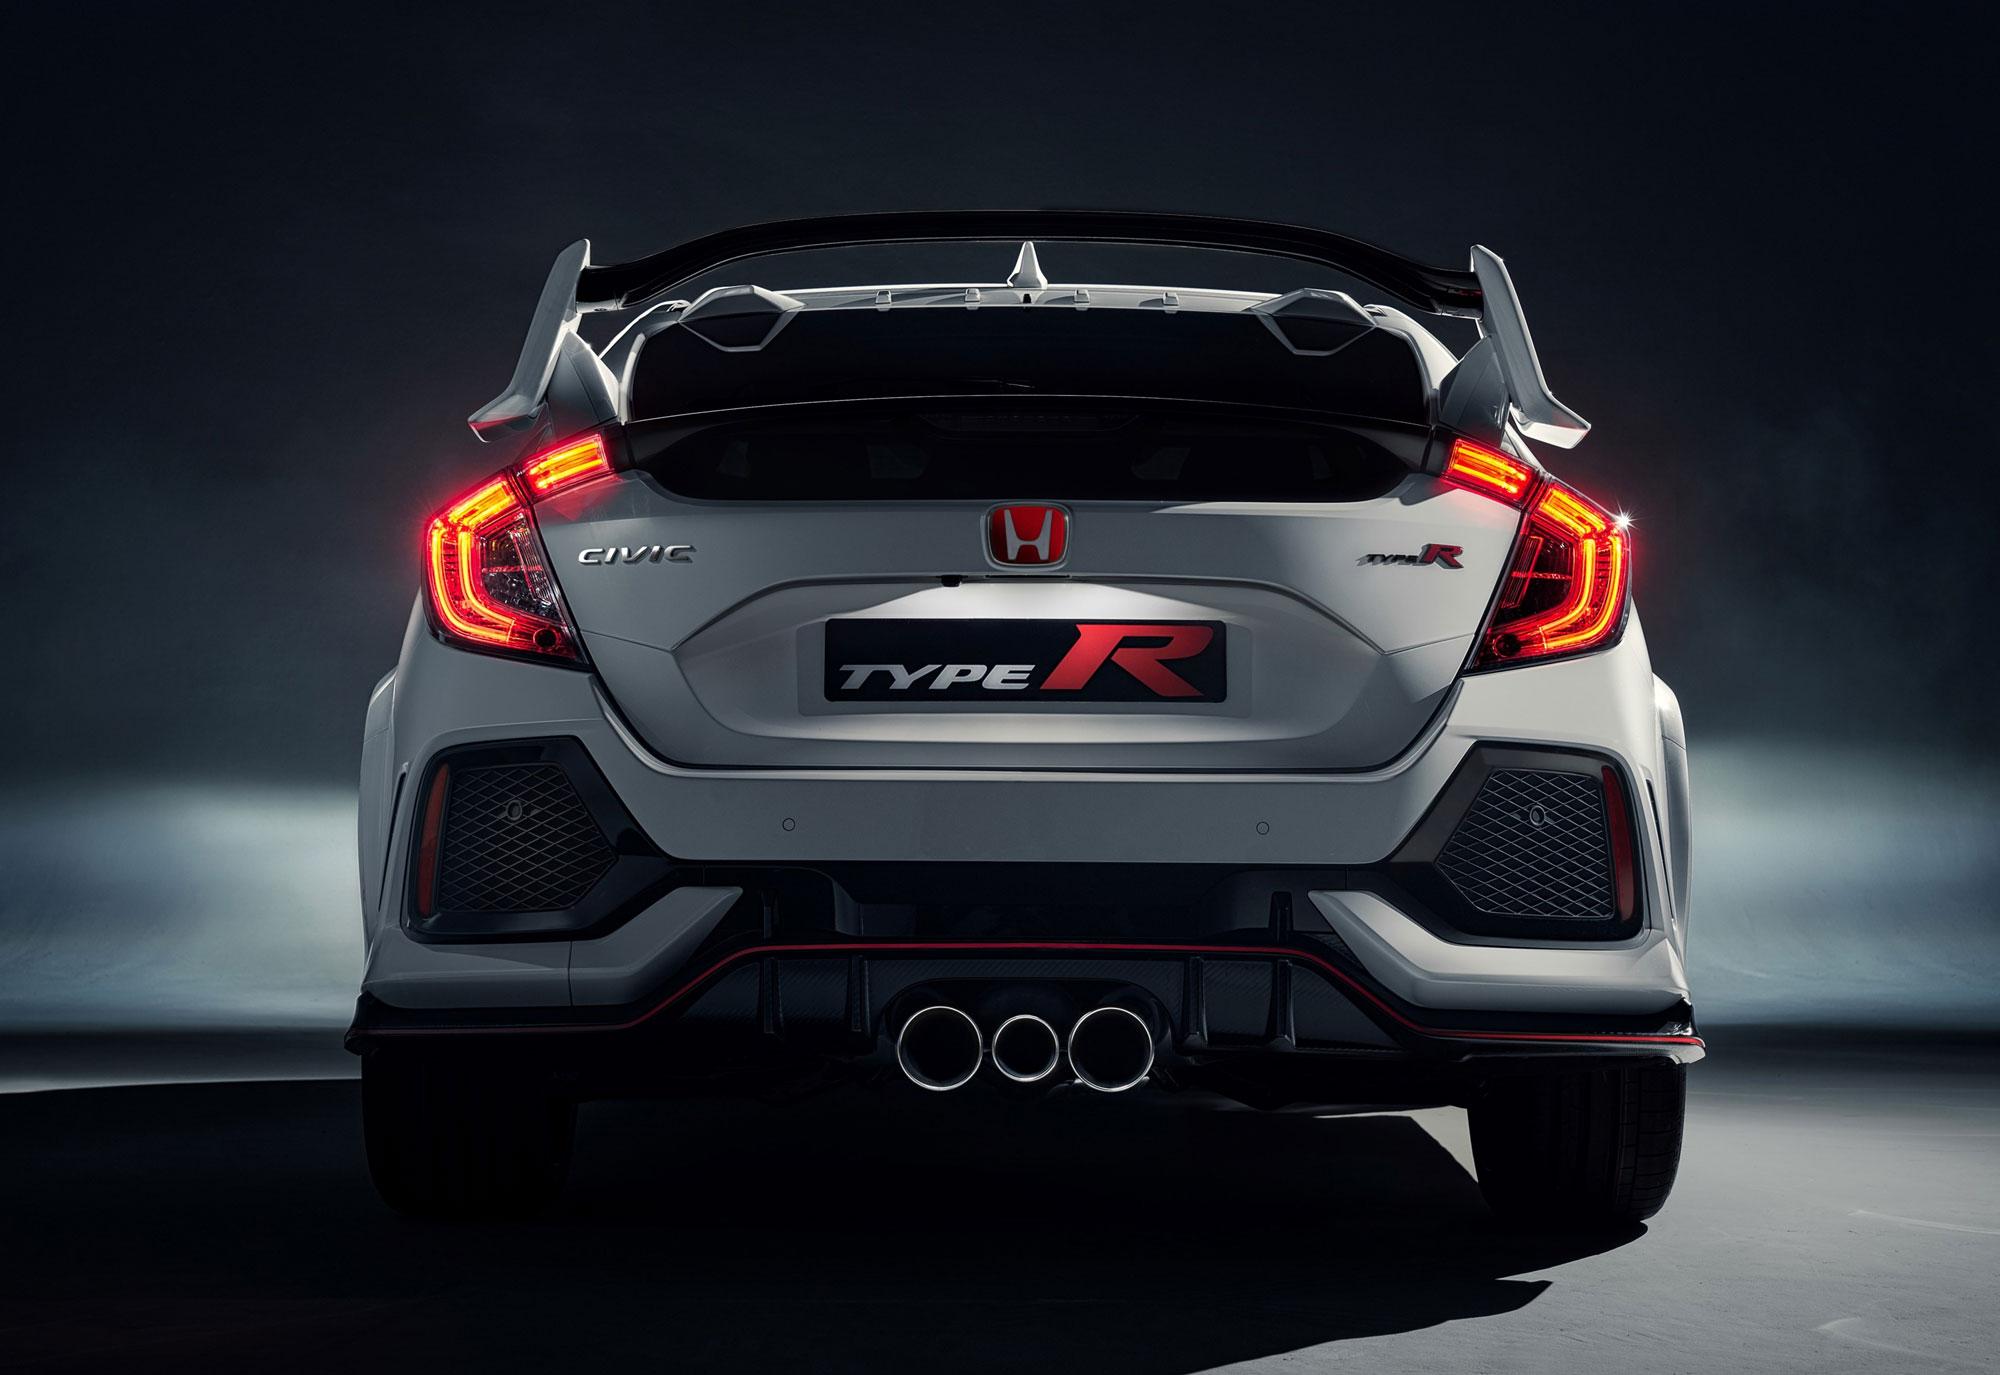 104501_All_new_Honda_Civic_Type_R_races_into_view_at_Geneva.jpg